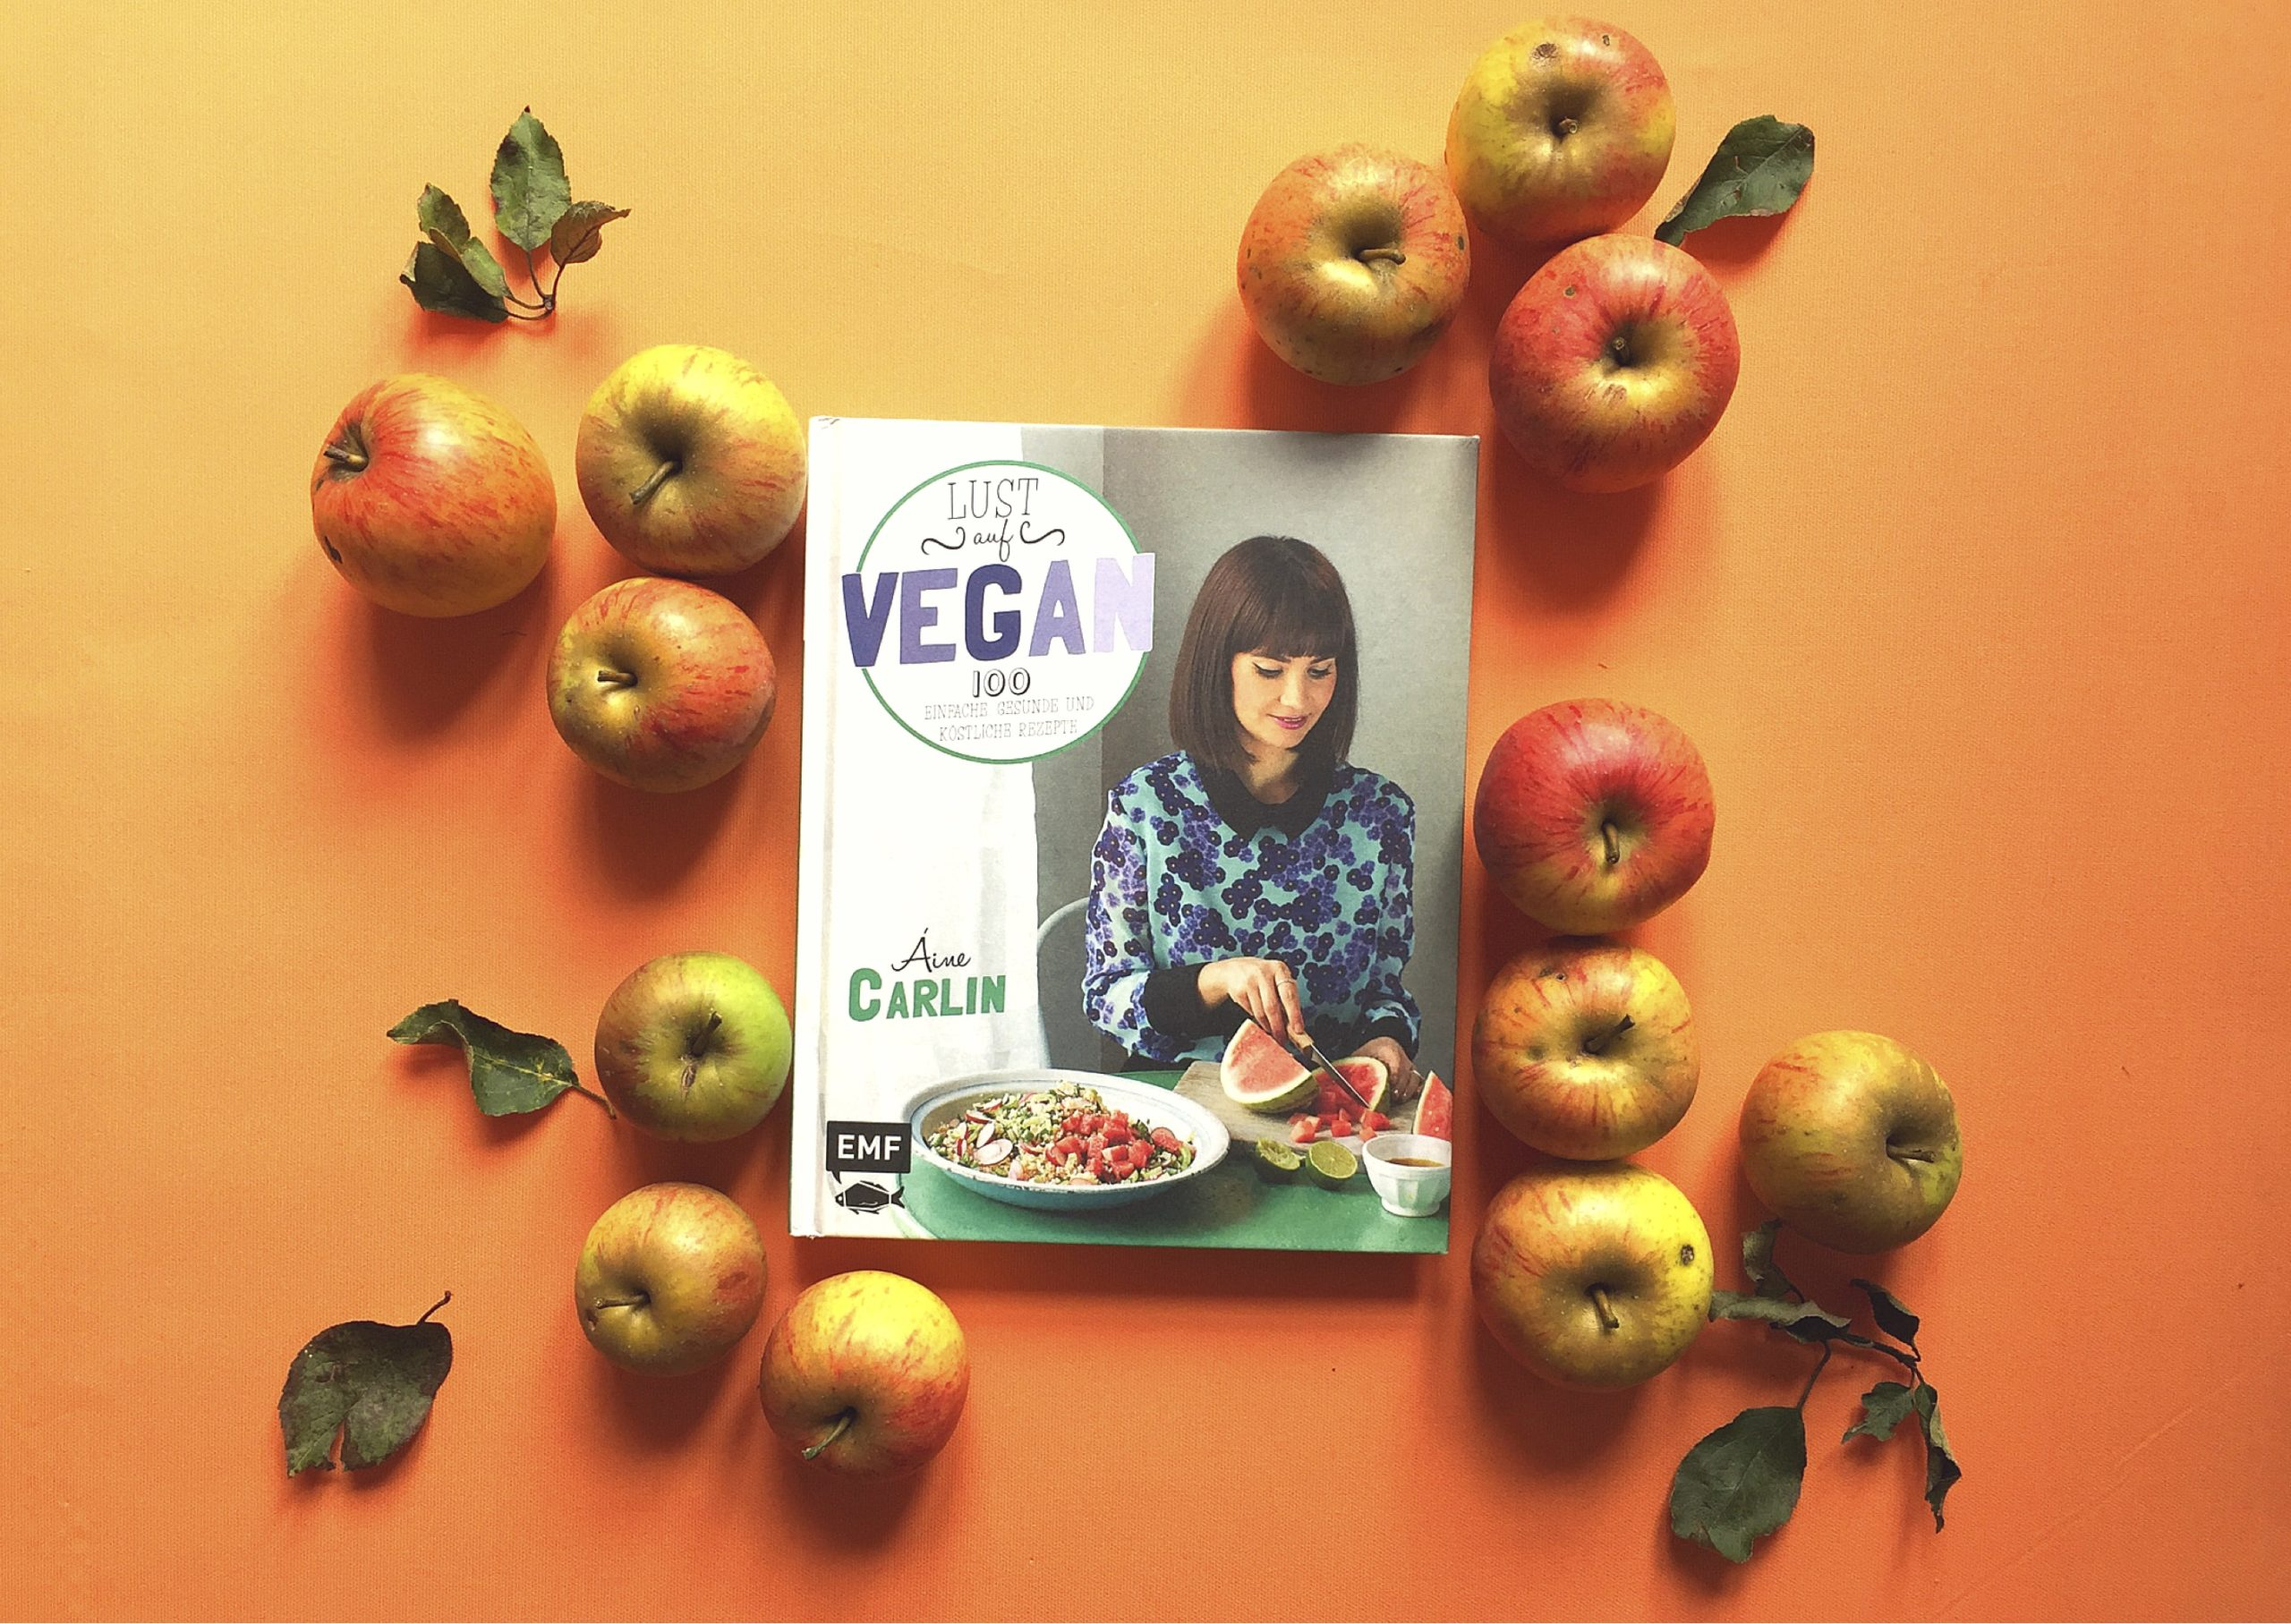 EMF Lust auf vegan https://www.pinterest.com/EMF_Verlag/